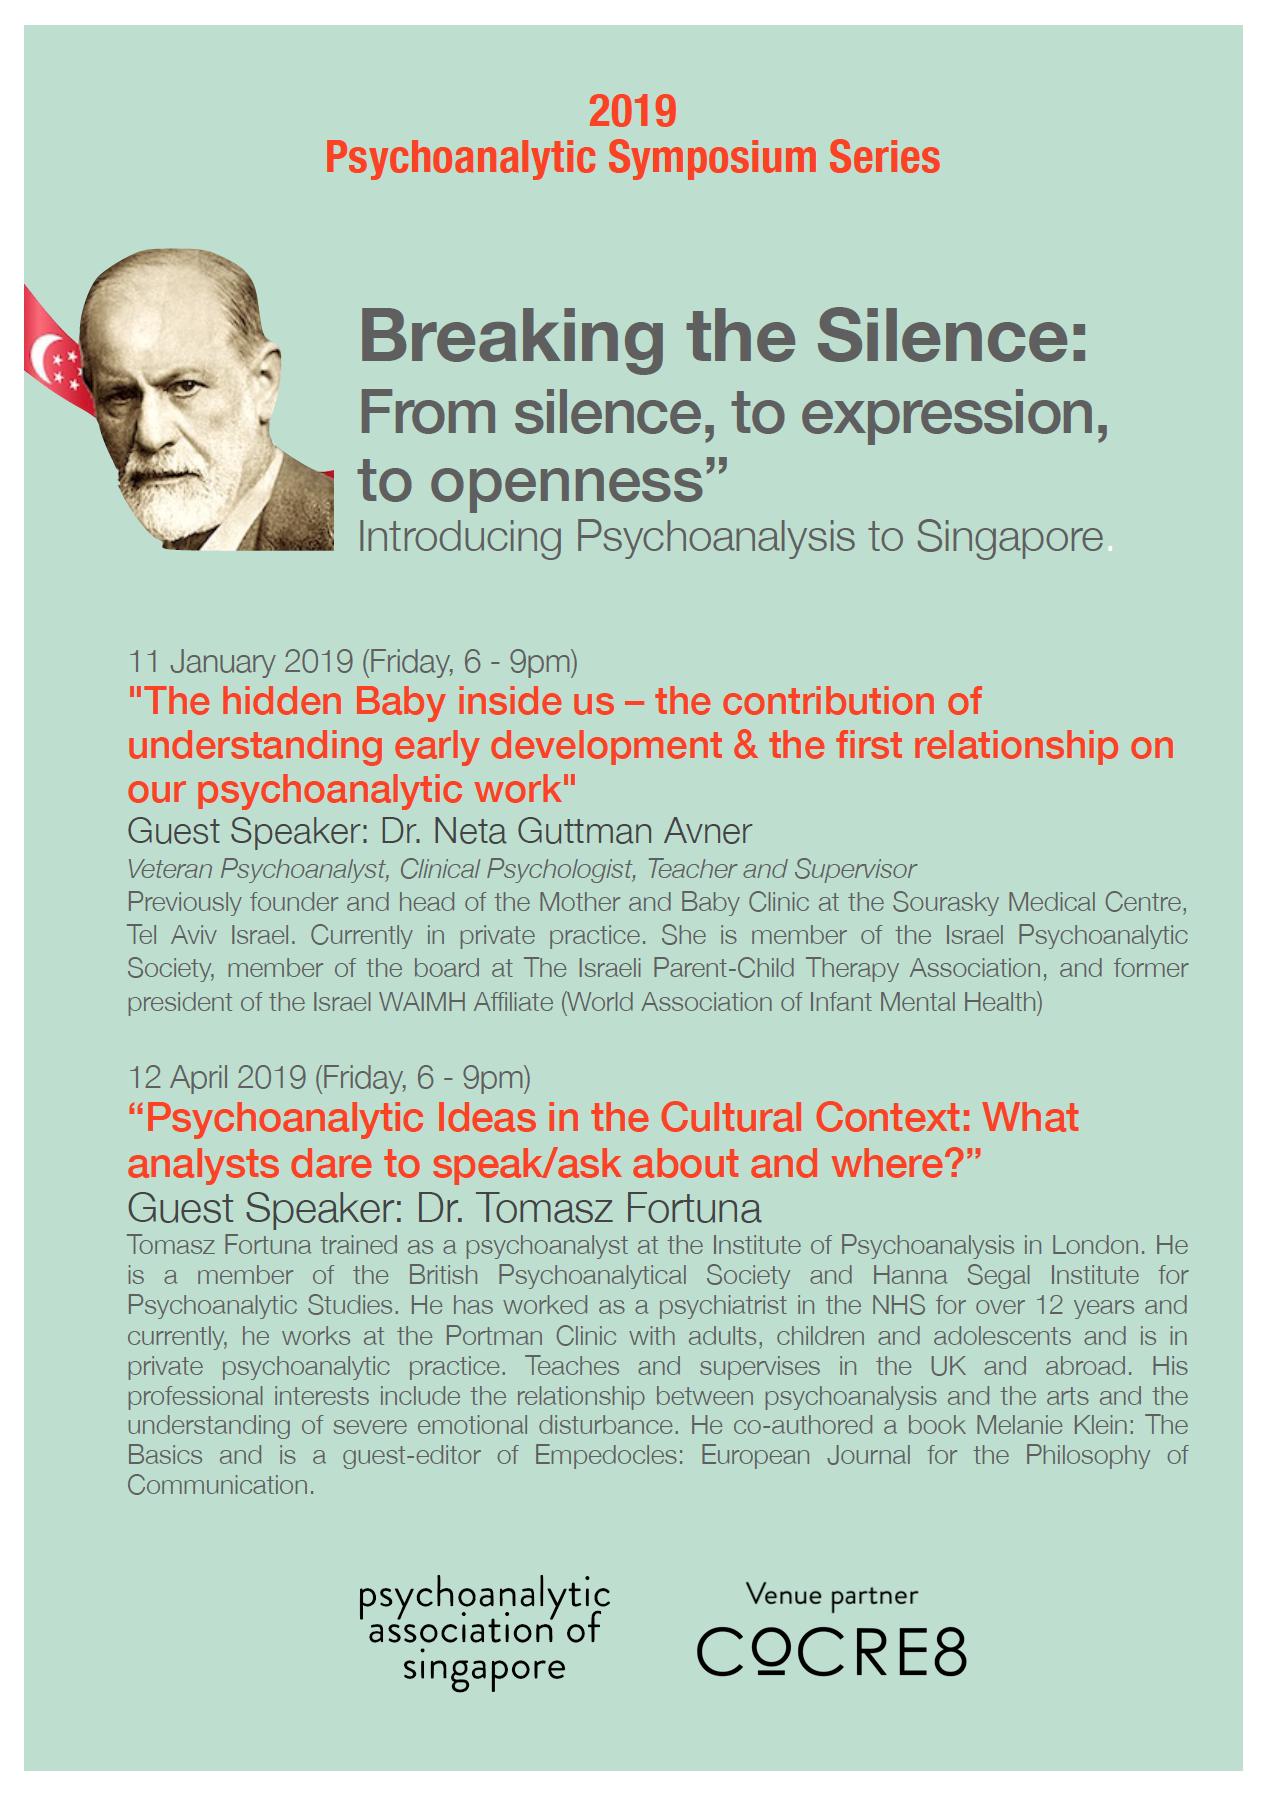 Psychoanalytic Symposium Series 2019 flyer - psychoanalysis.sg.png